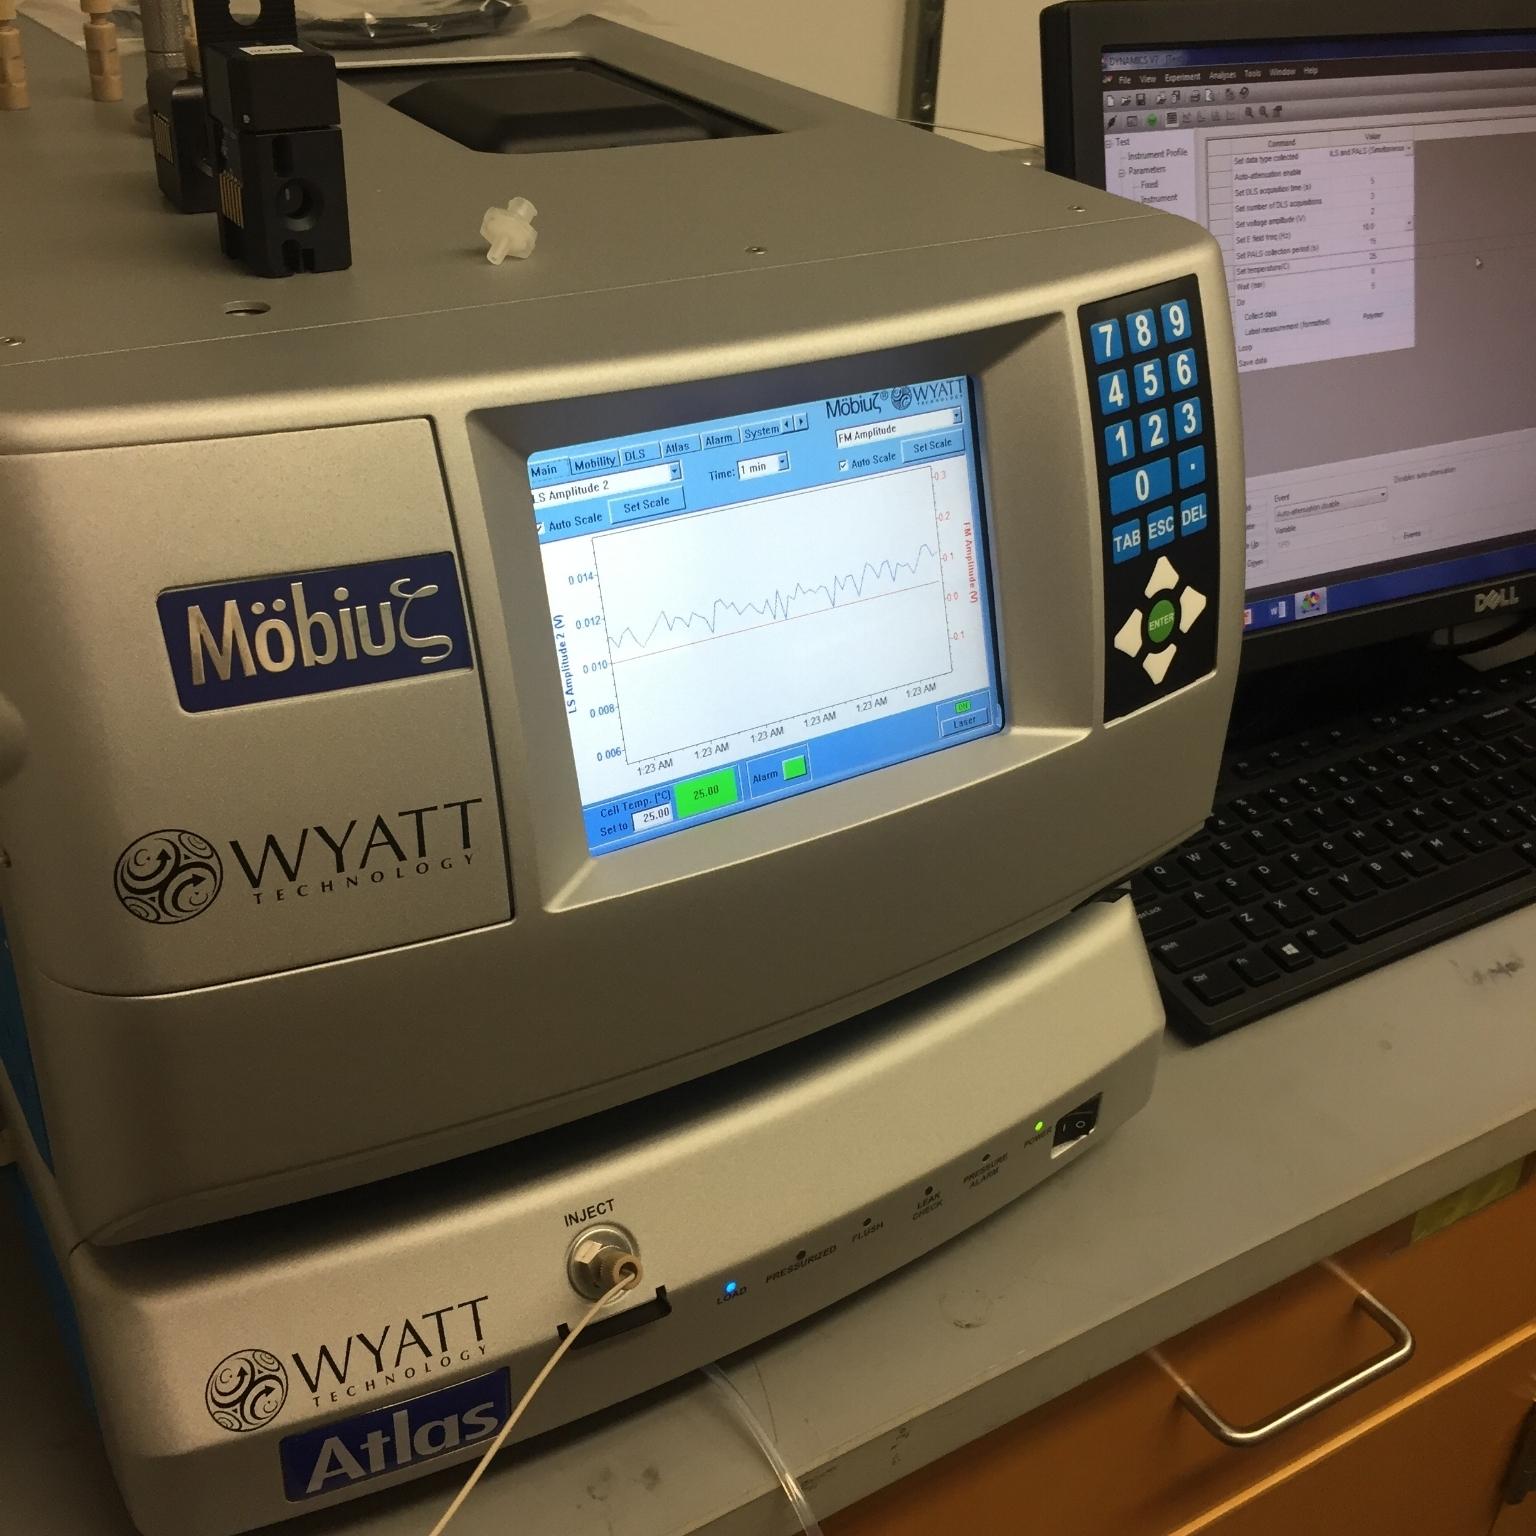 Wyatt Mobius - DLS & Electrophoretic Mobility